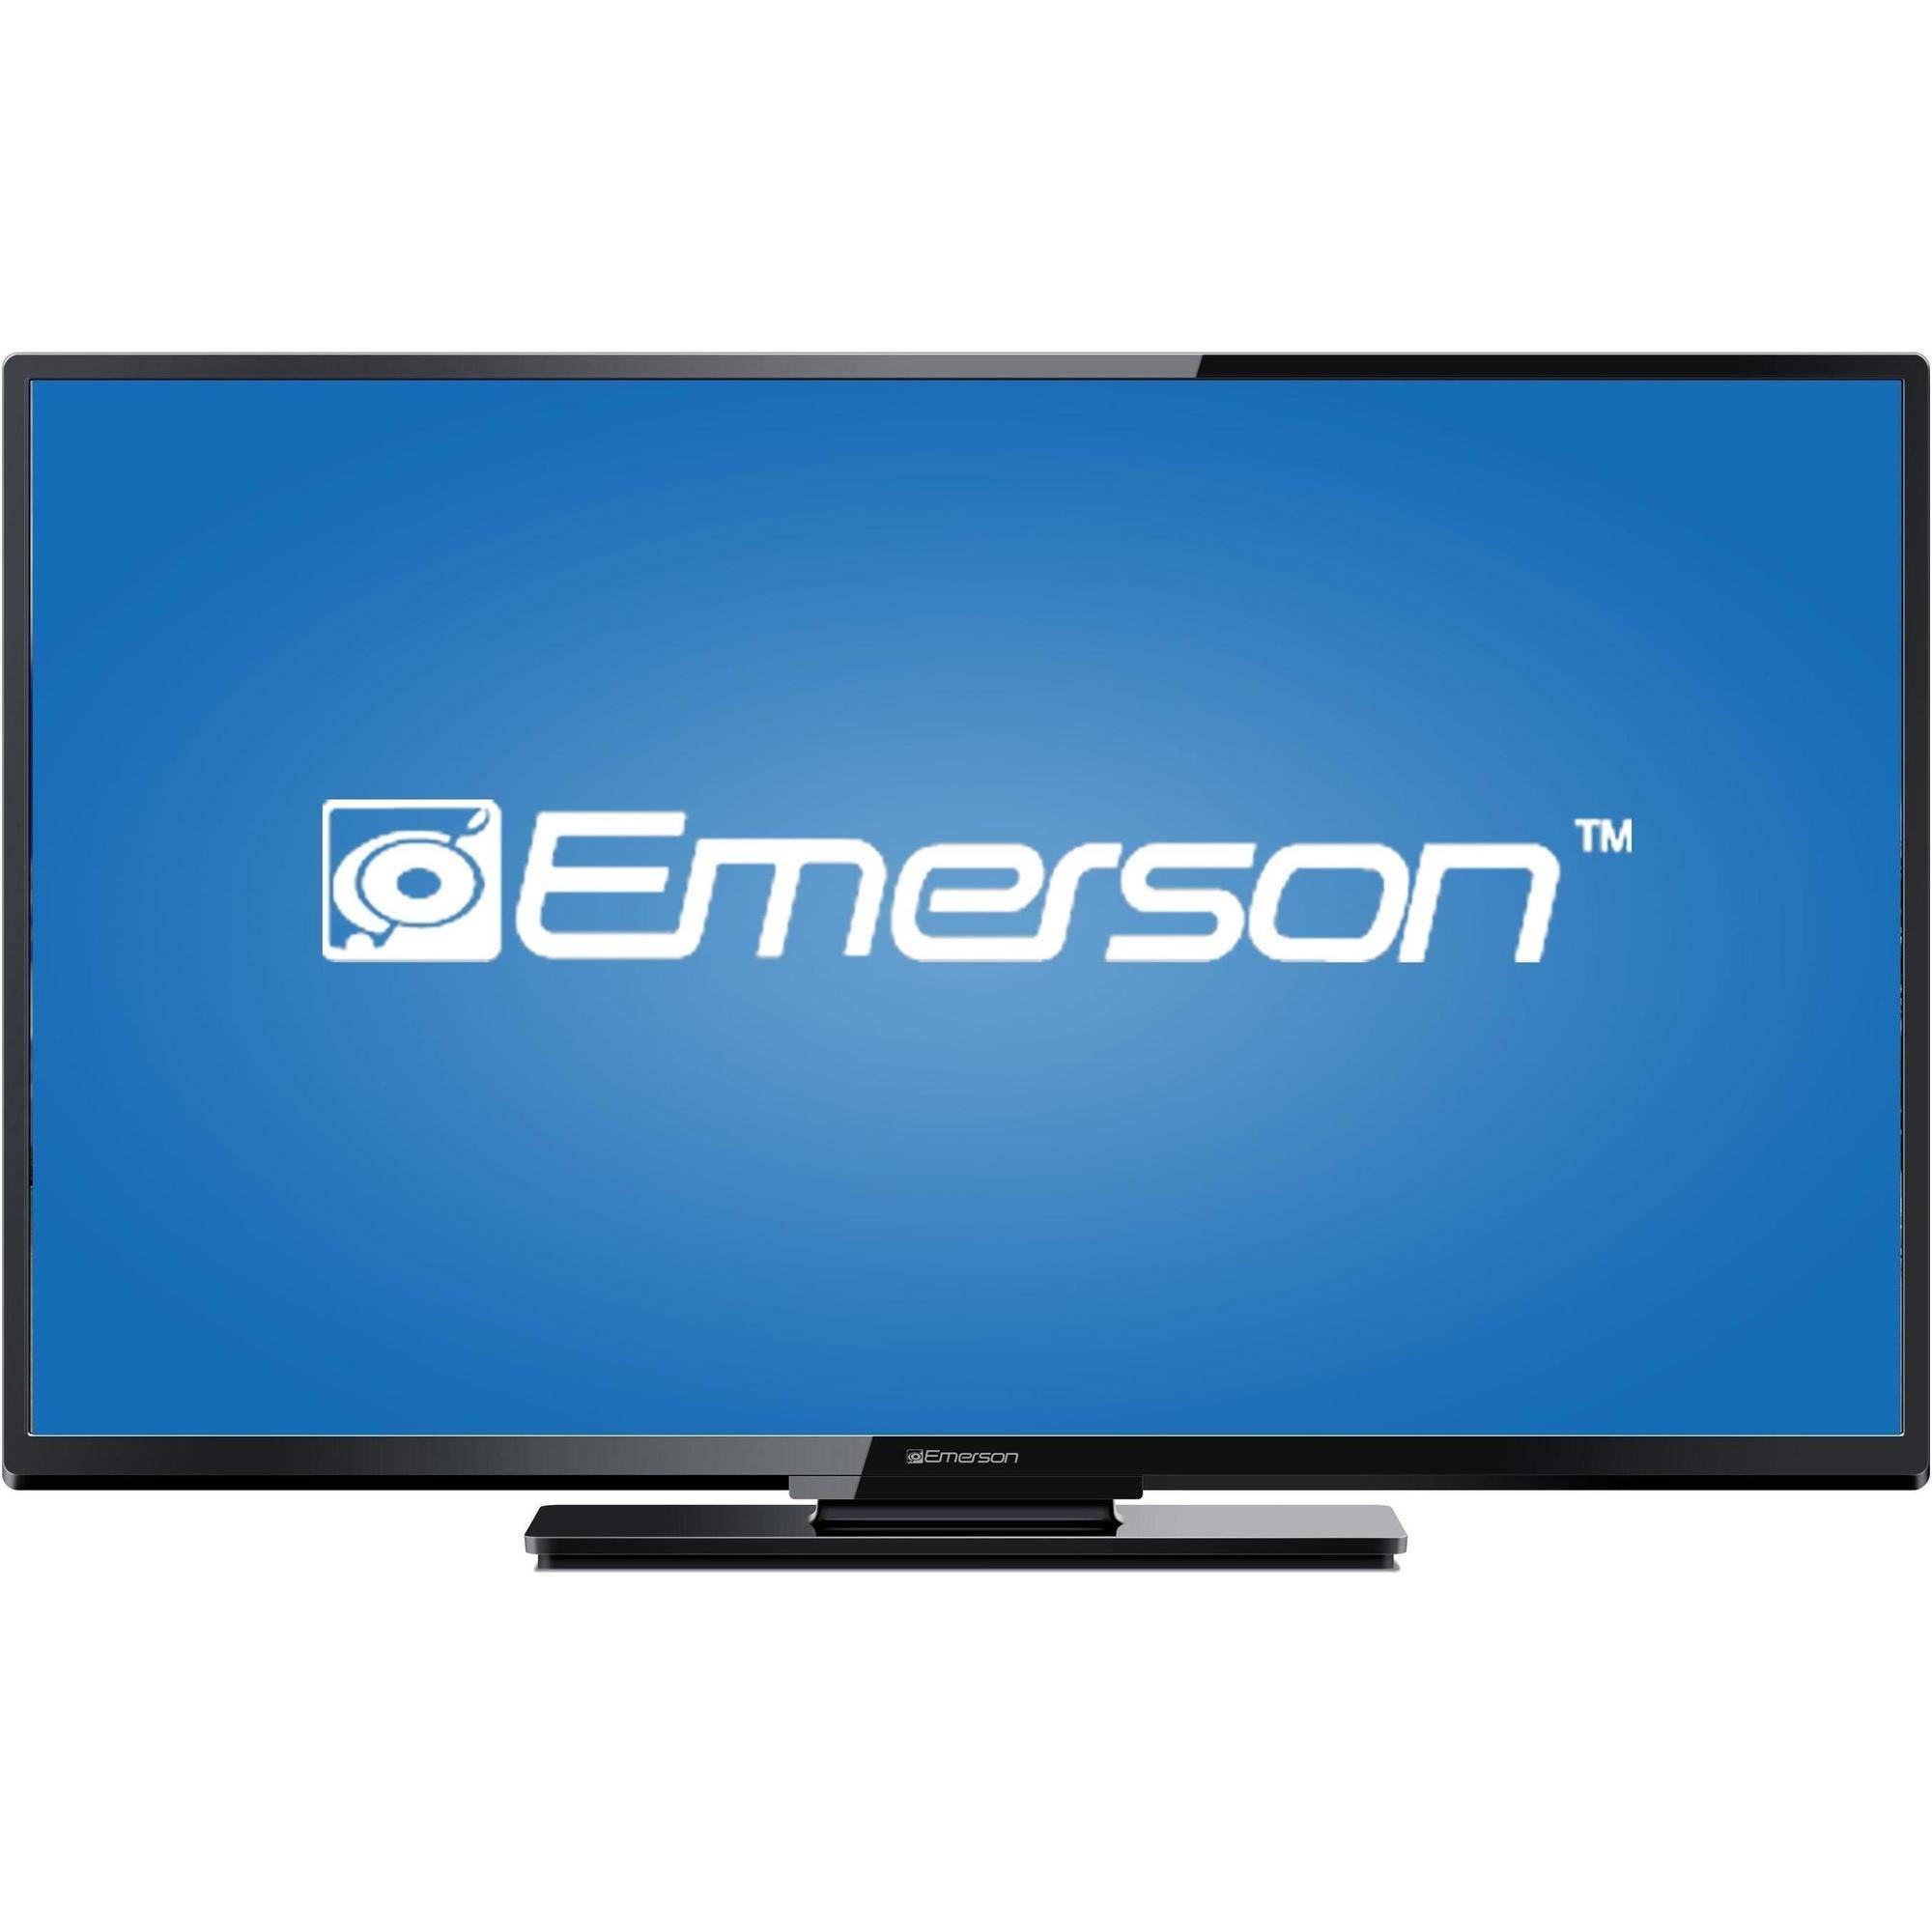 "Refurbished Emerson LF402EM6F 40"" 1080p 120Hz Class LED HDTV by Emerson"